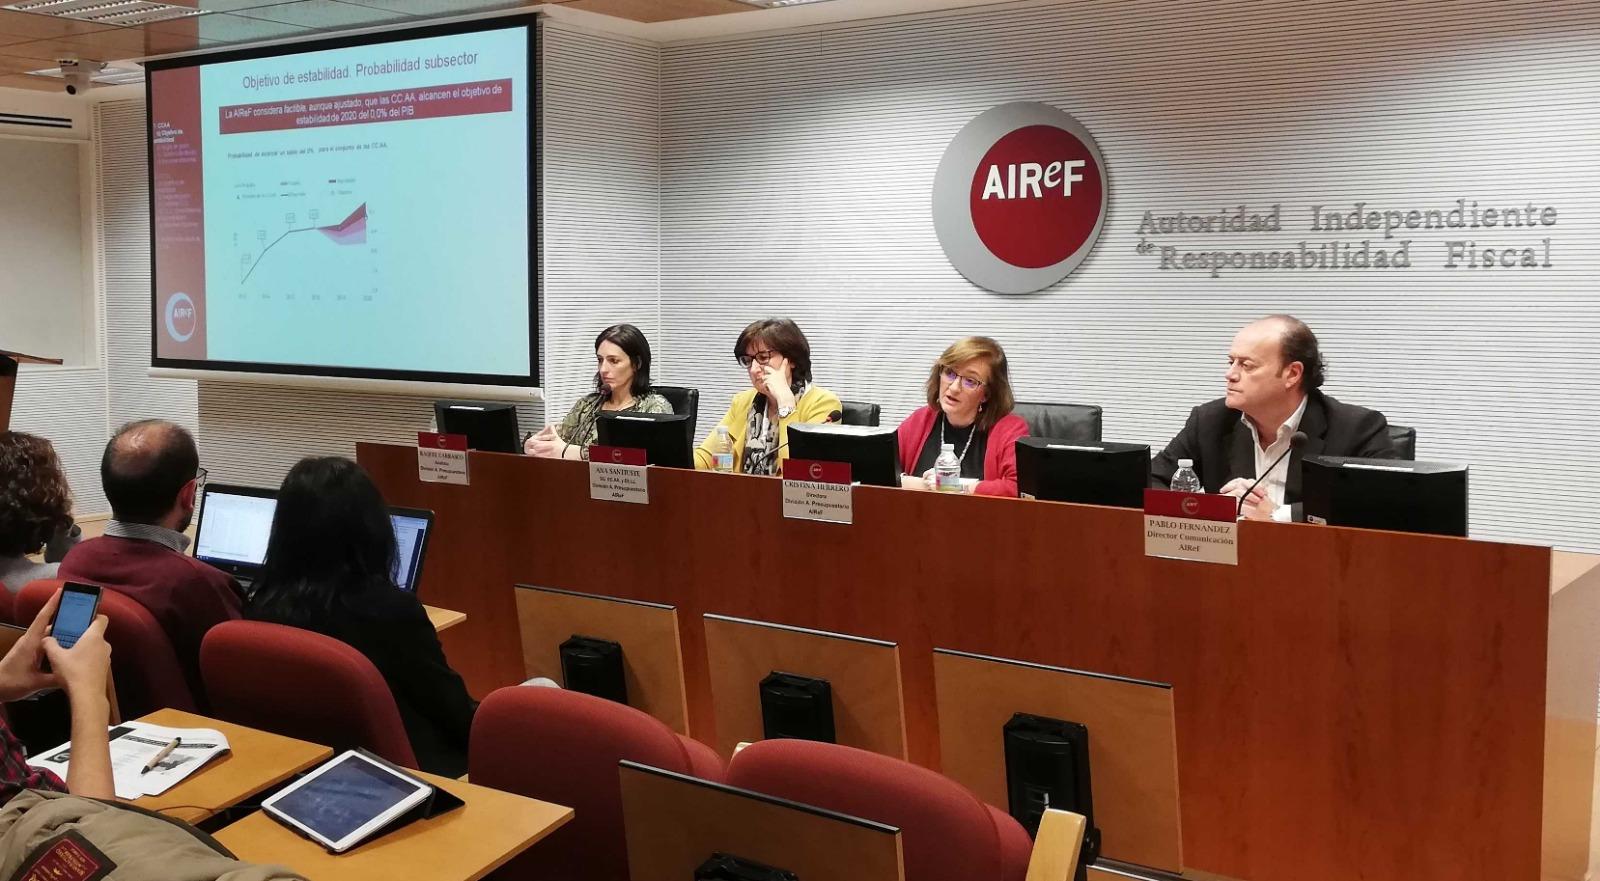 La presidenta interina de la AIReF, Cristina Herrero